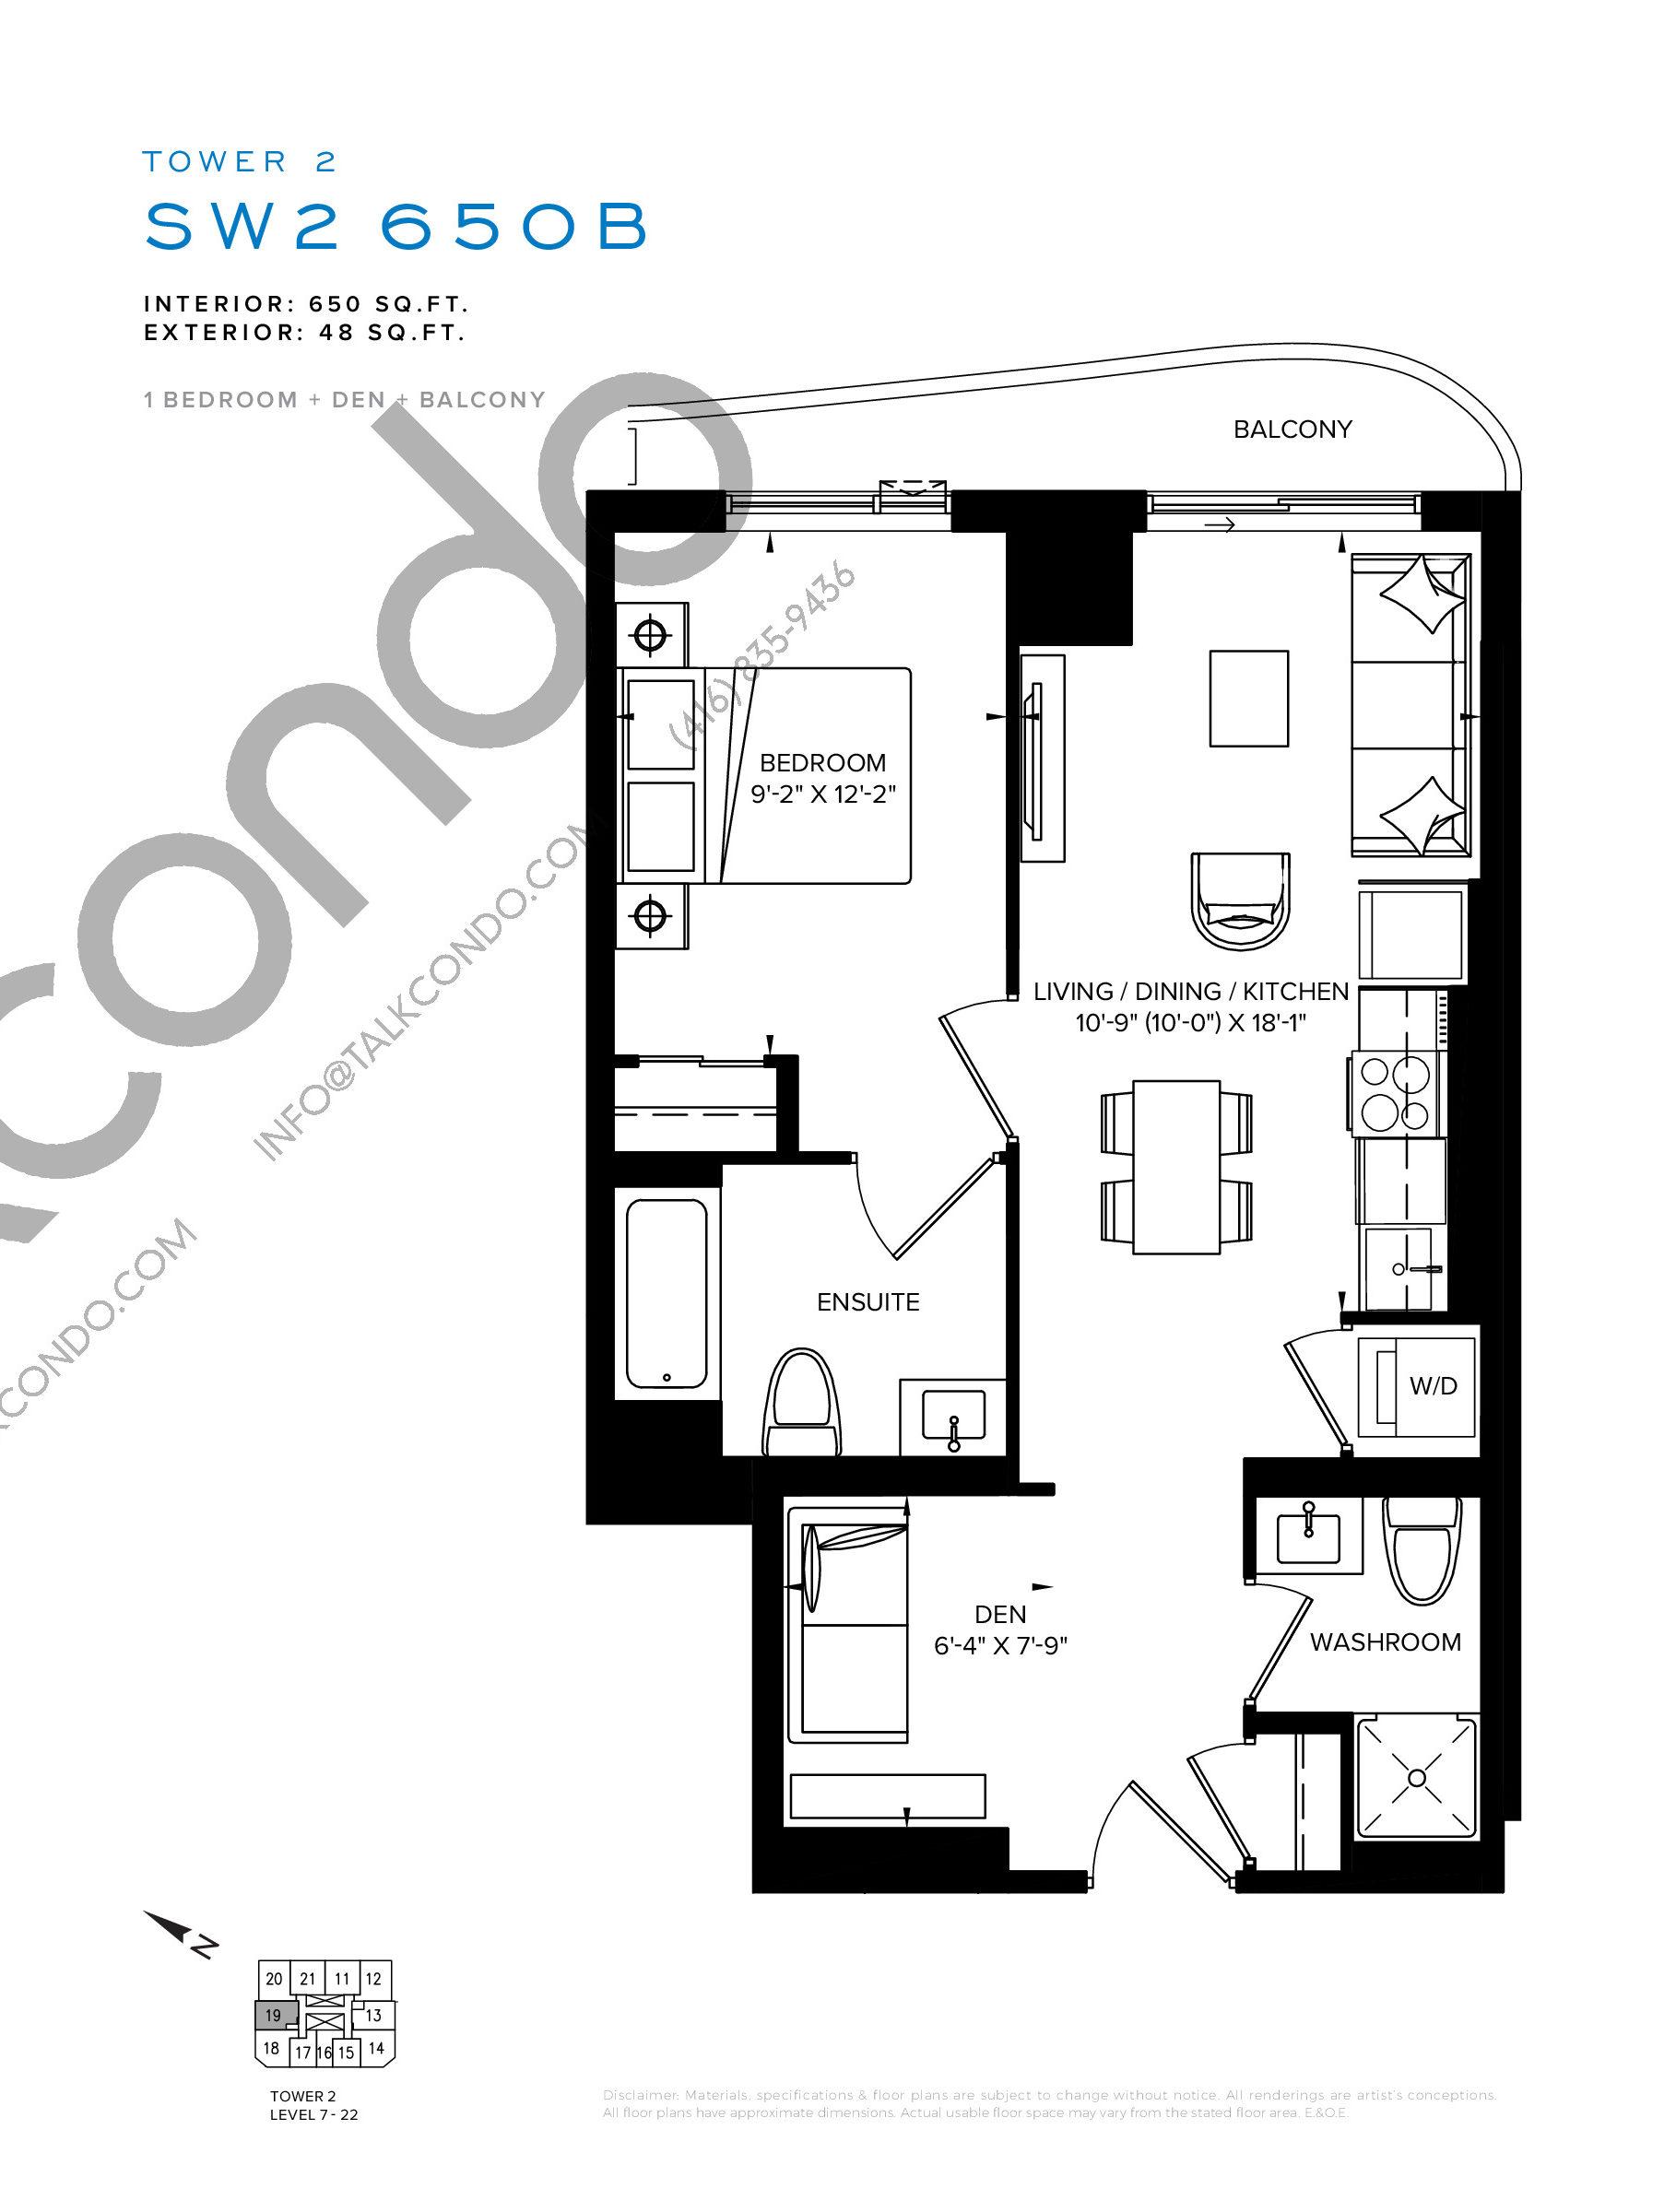 SW2 650B Floor Plan at SXSW Tower 2 Condos (SXSW2) - 650 sq.ft